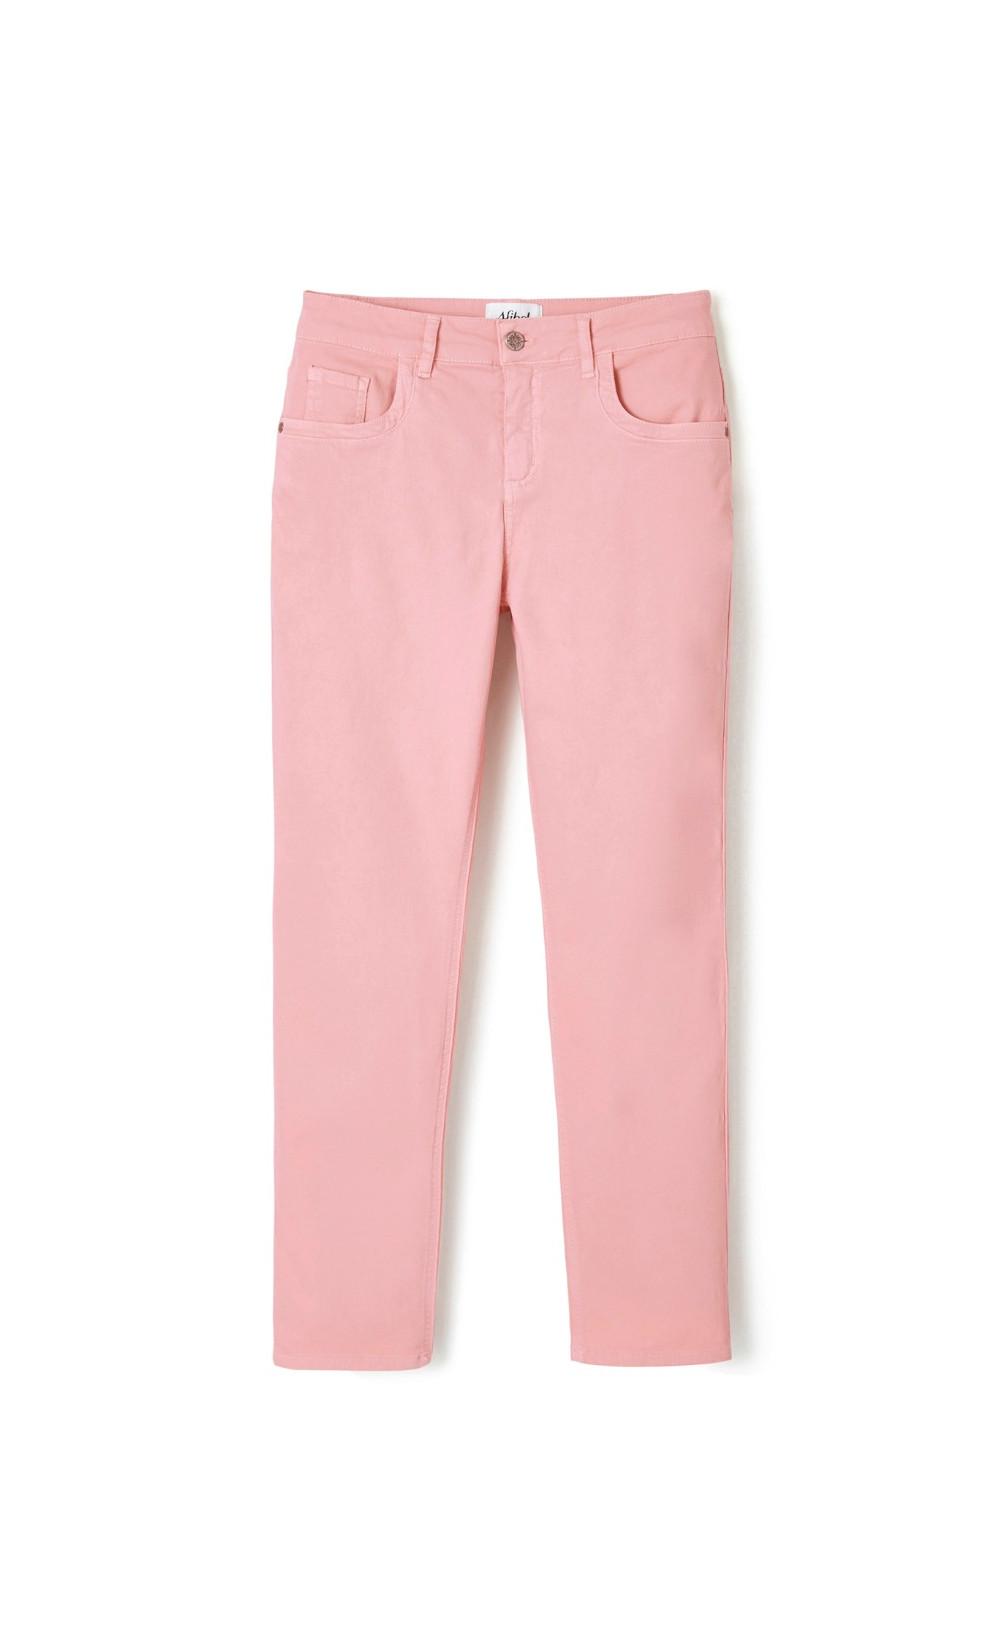 pantalon - NOMINAL